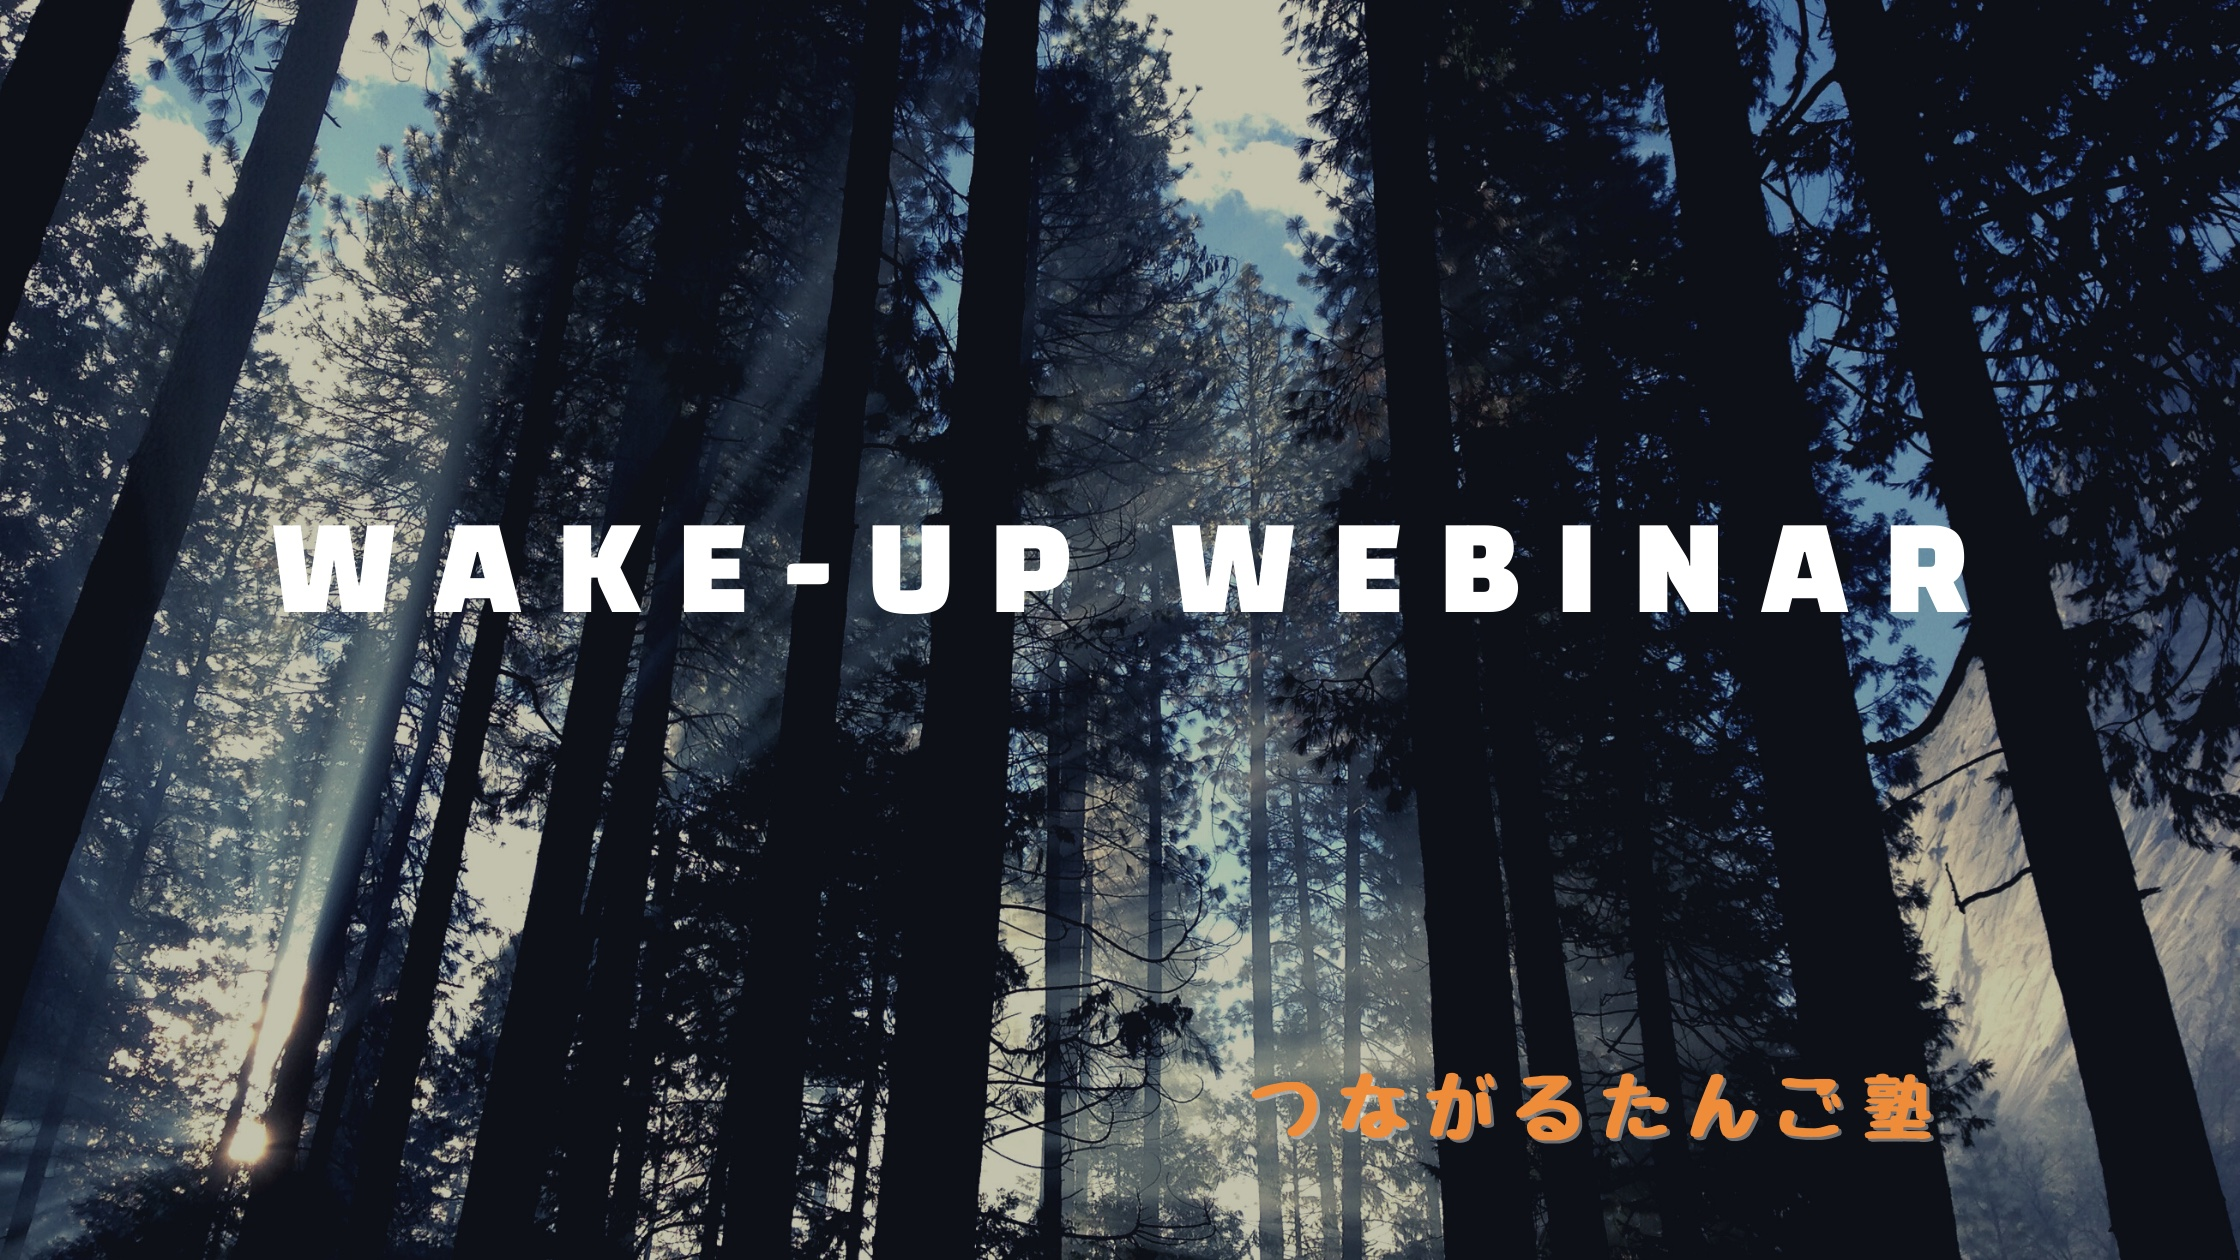 WAKE-UP WEBINAR(つながるたんごオンライン朝塾)2020年9月火曜日(8,15,22日)6時 マンスリーチケット